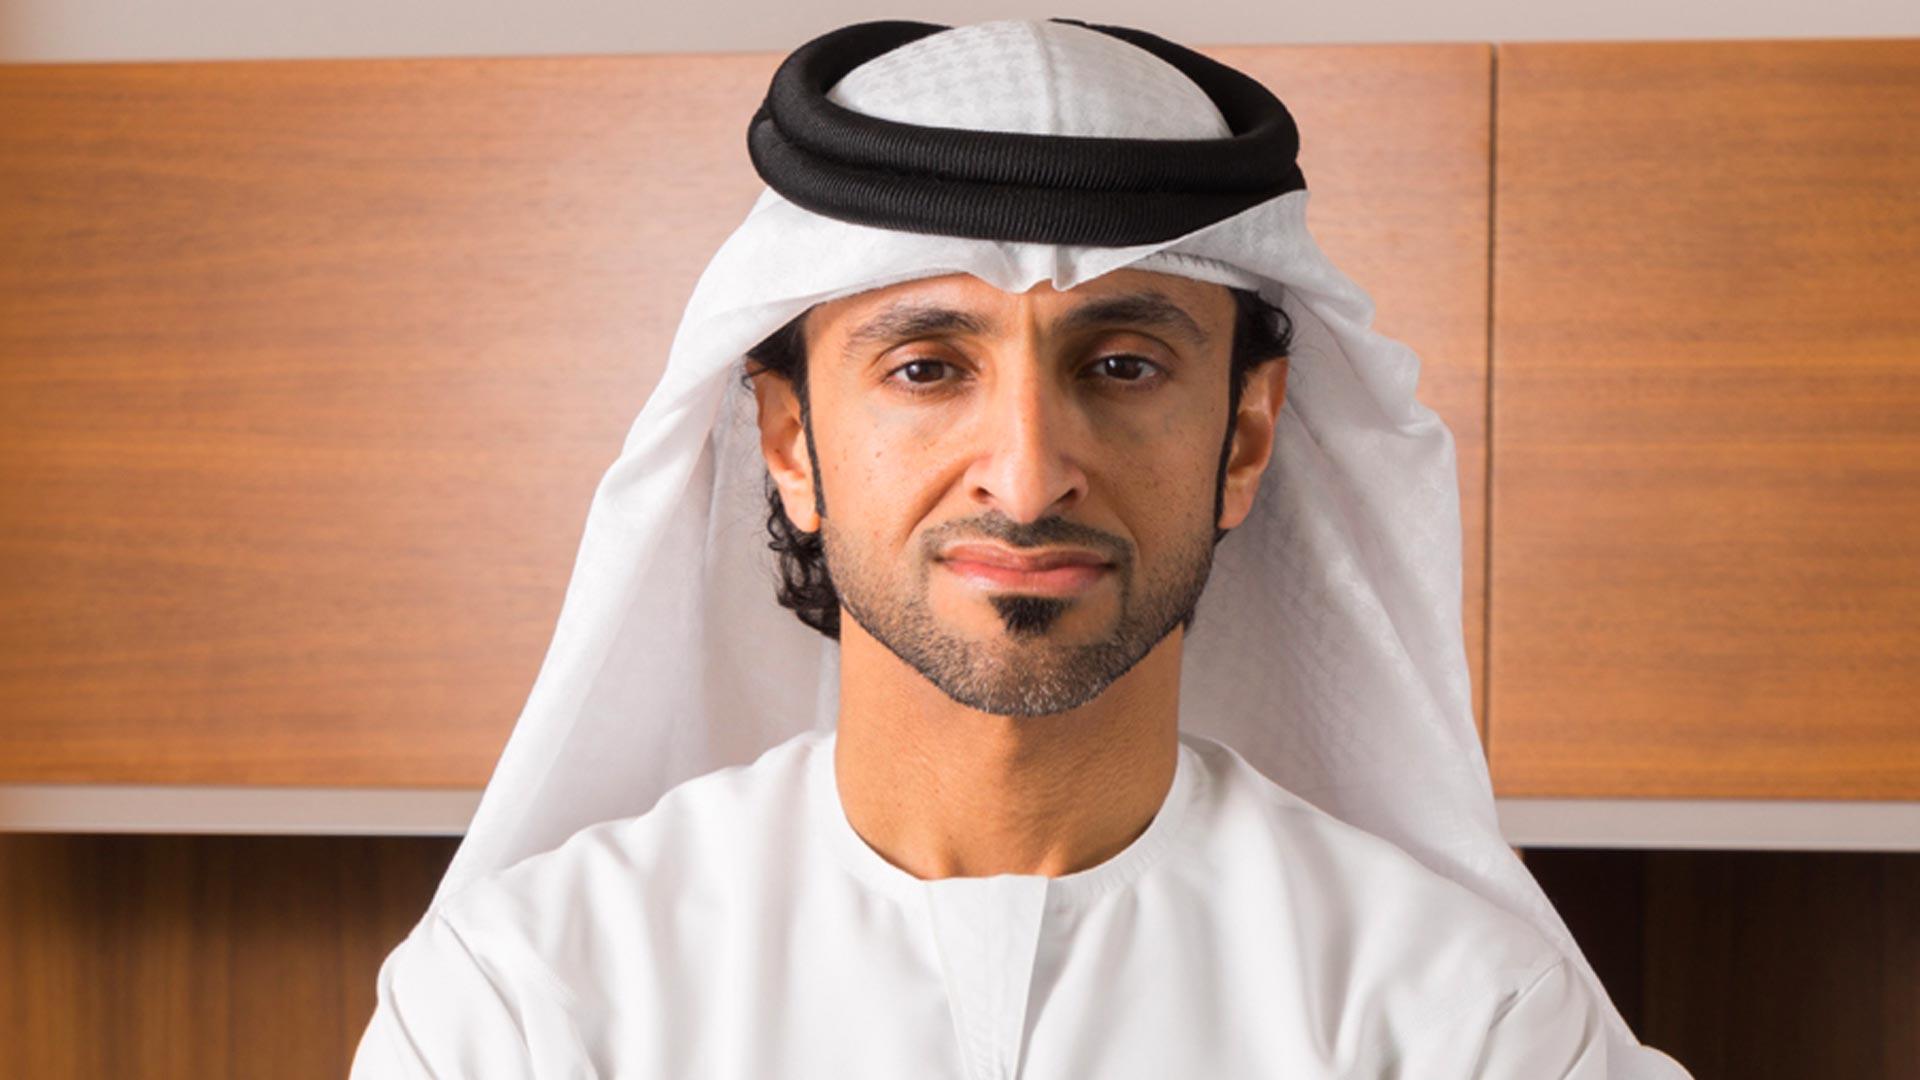 Agthia Appoints Tariq Al Wahedi as Acting CEO